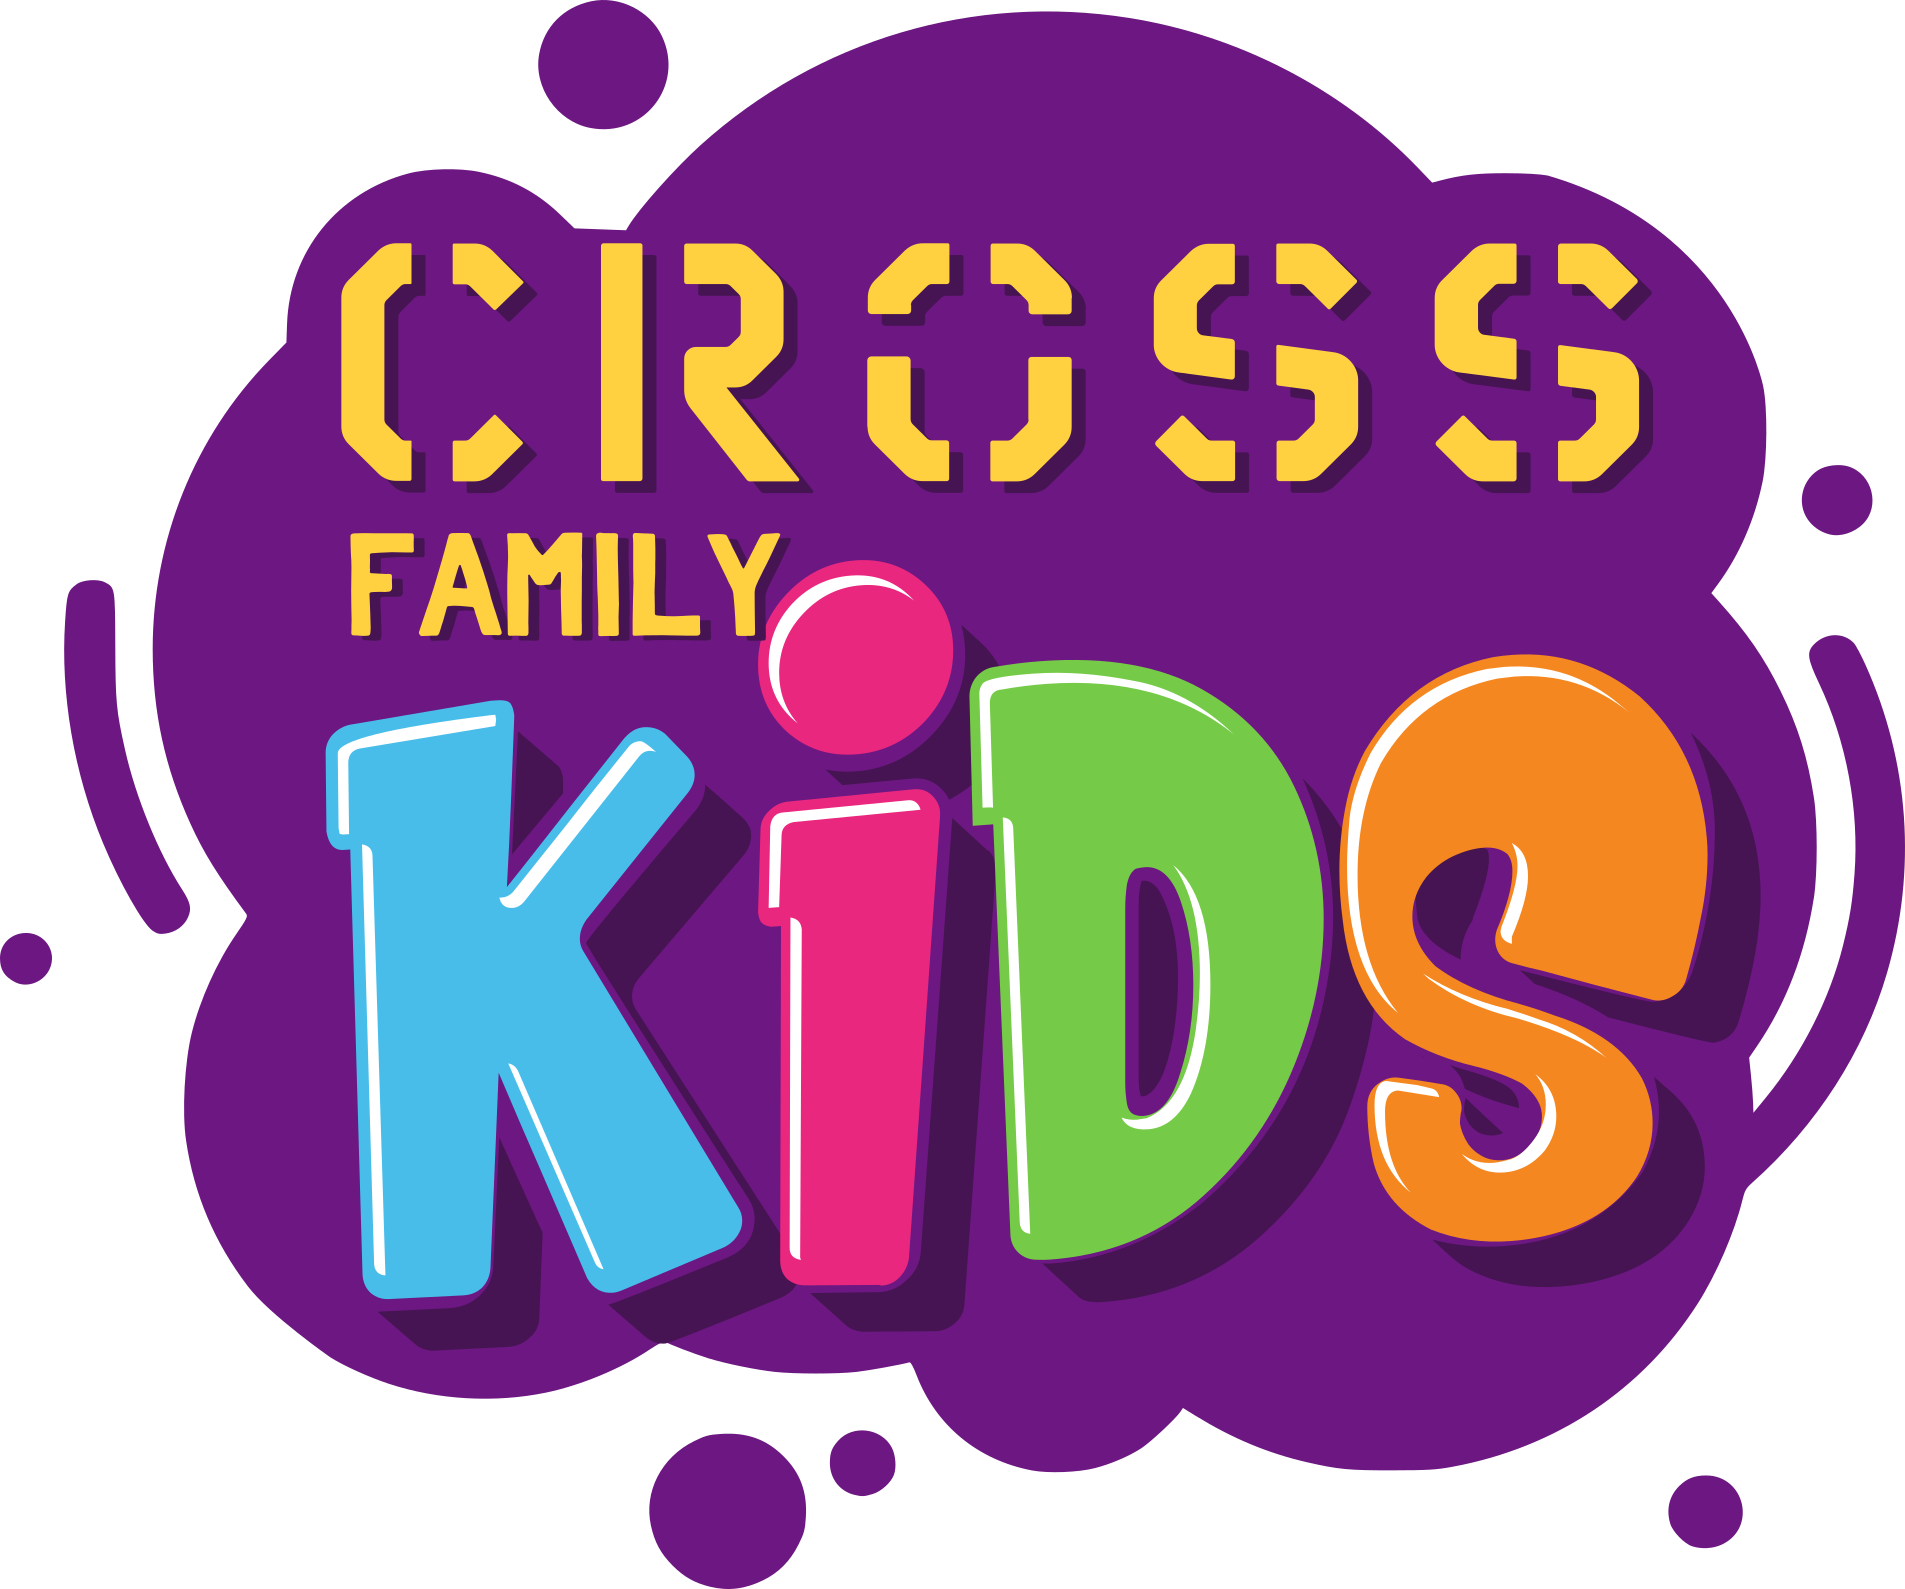 Cross Family Kids Logo Only.png